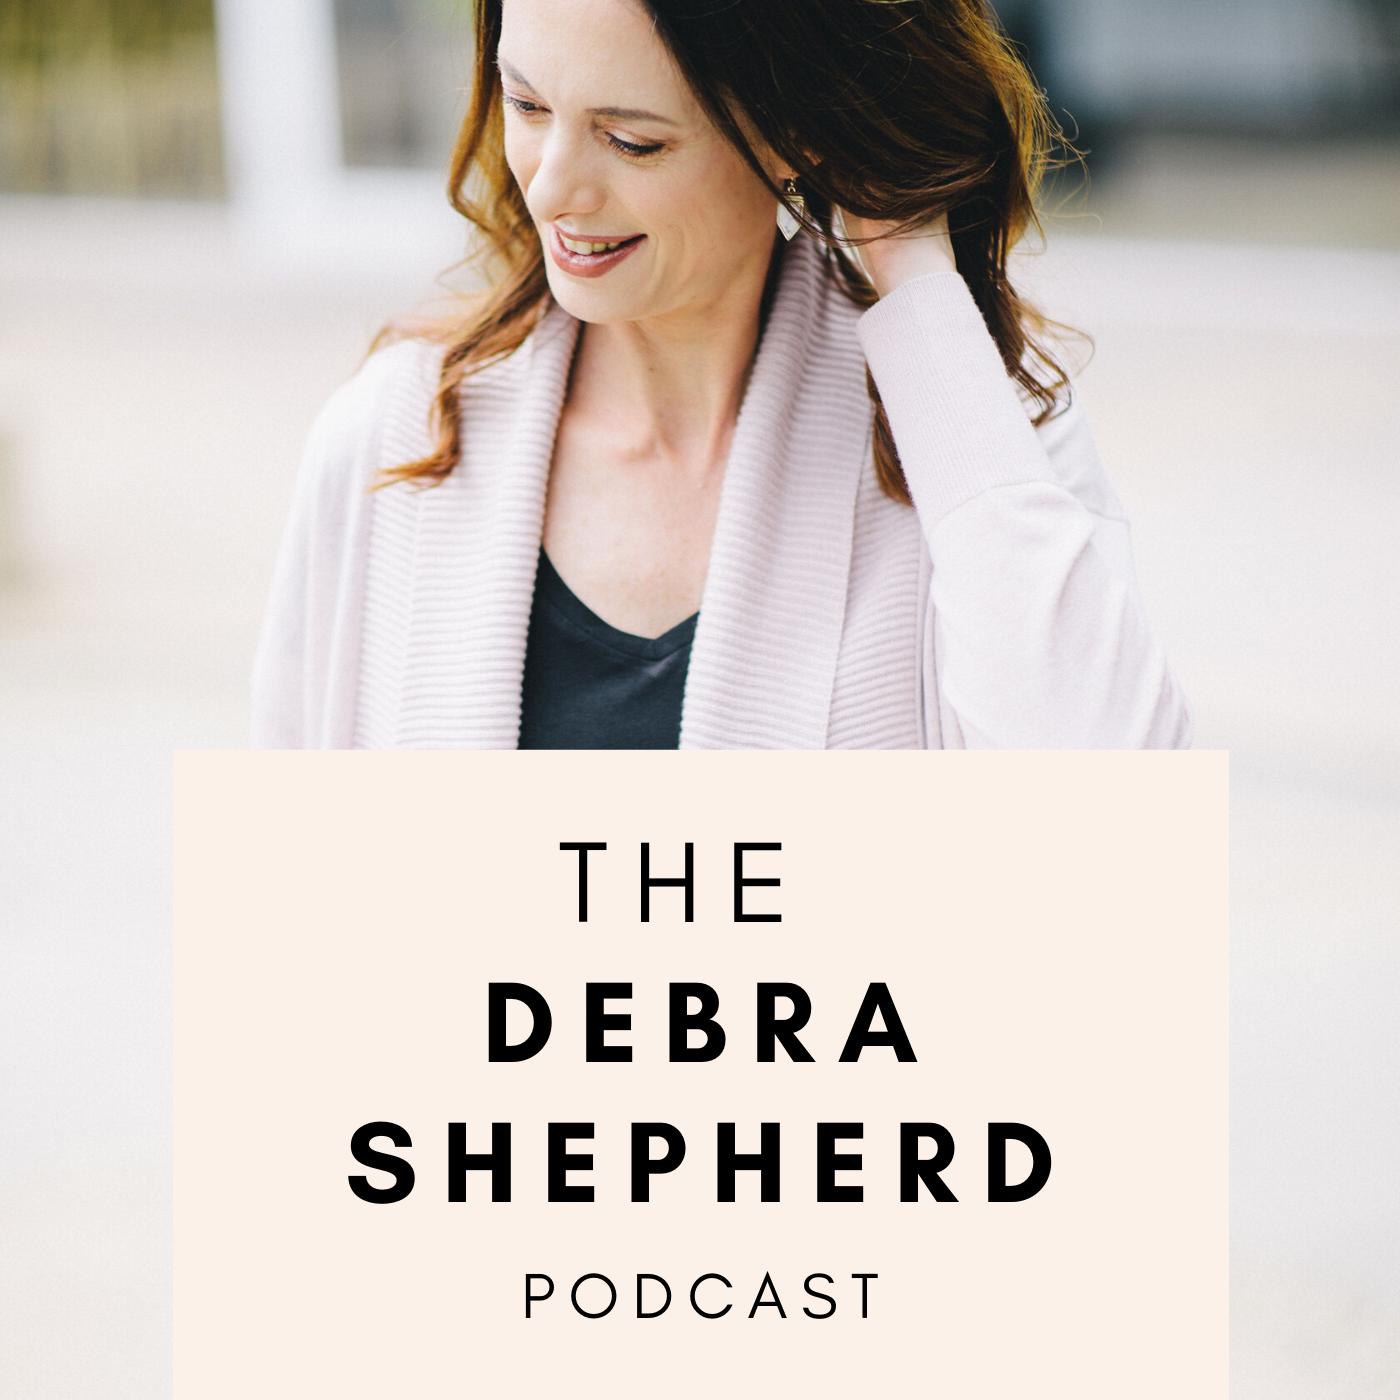 The Debra Shepherd Podcast show image